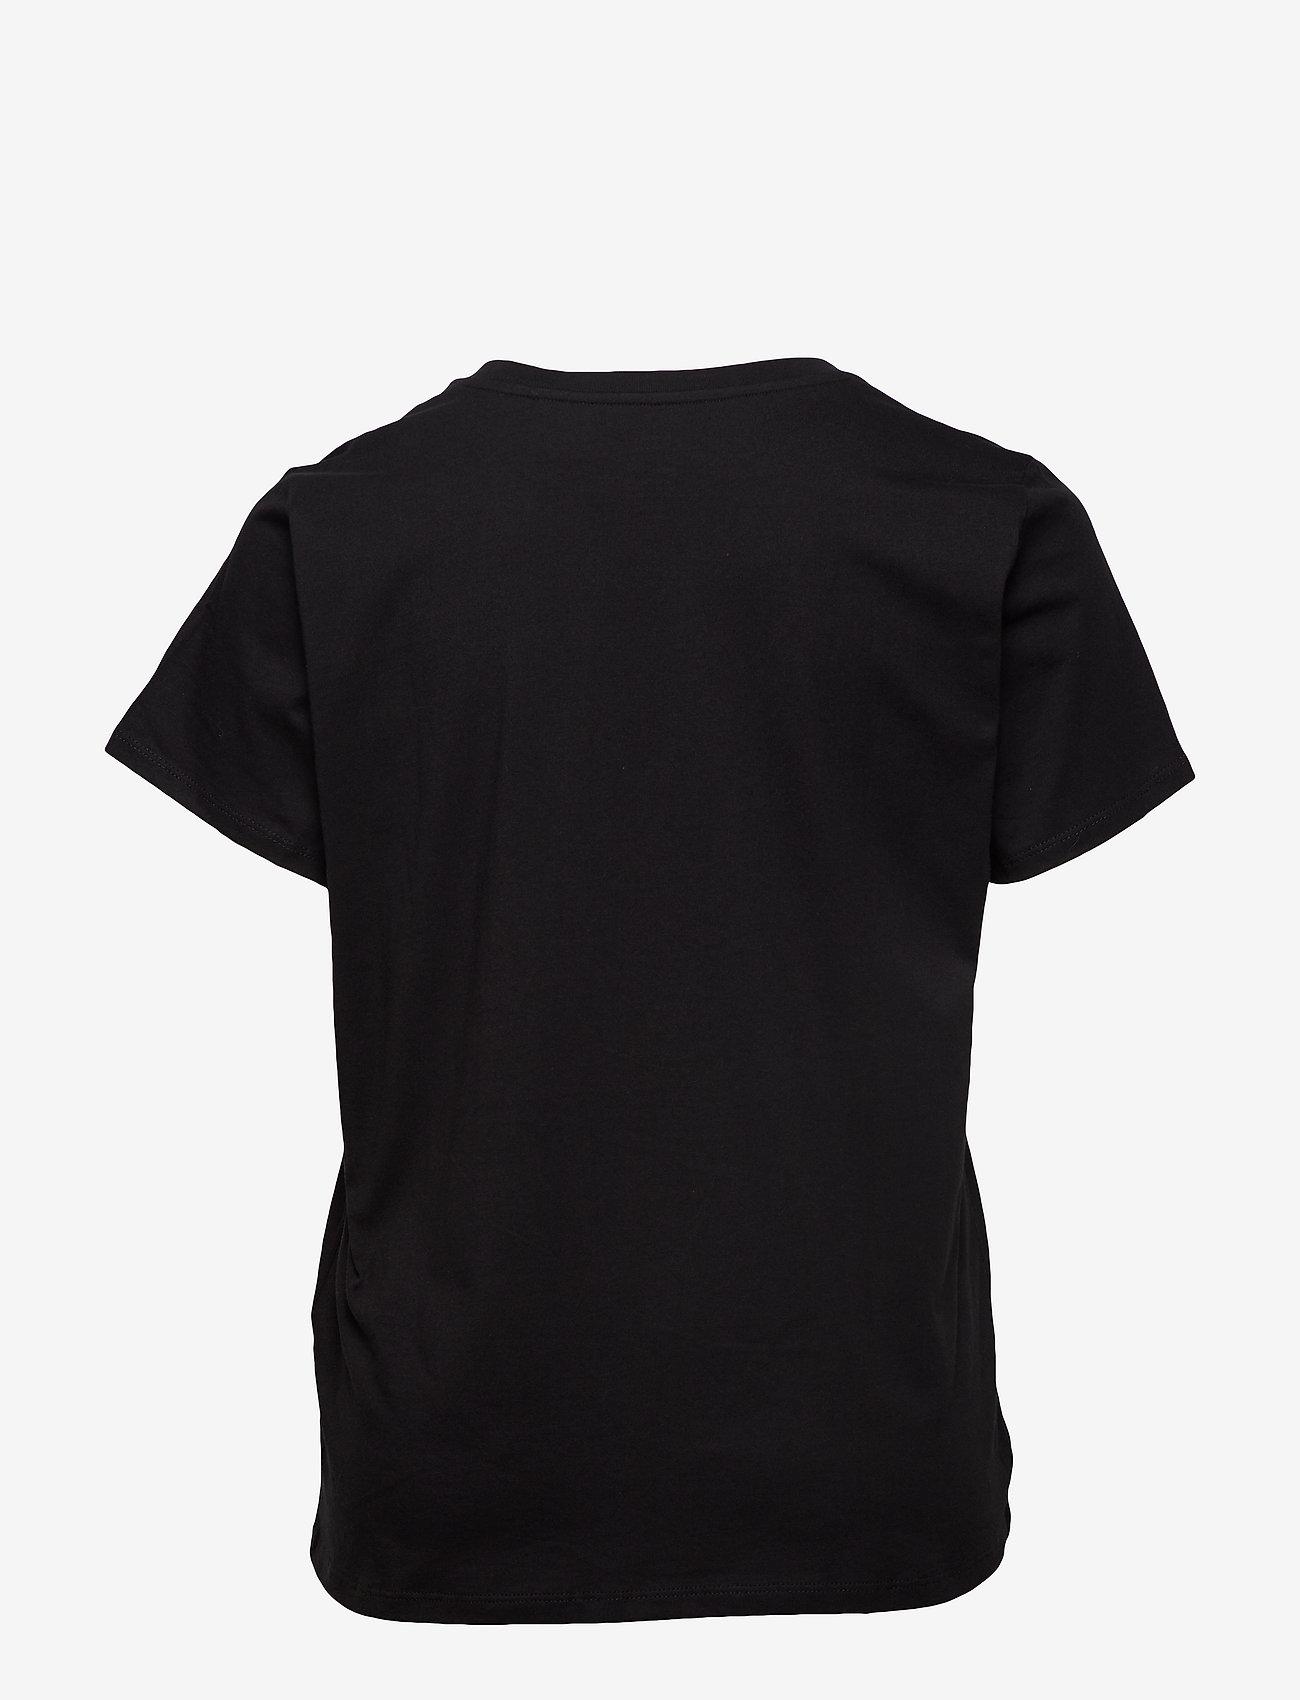 Levi's Plus Size - PL PERFECT CREW MINERAL BLACK - t-shirts - blacks - 1